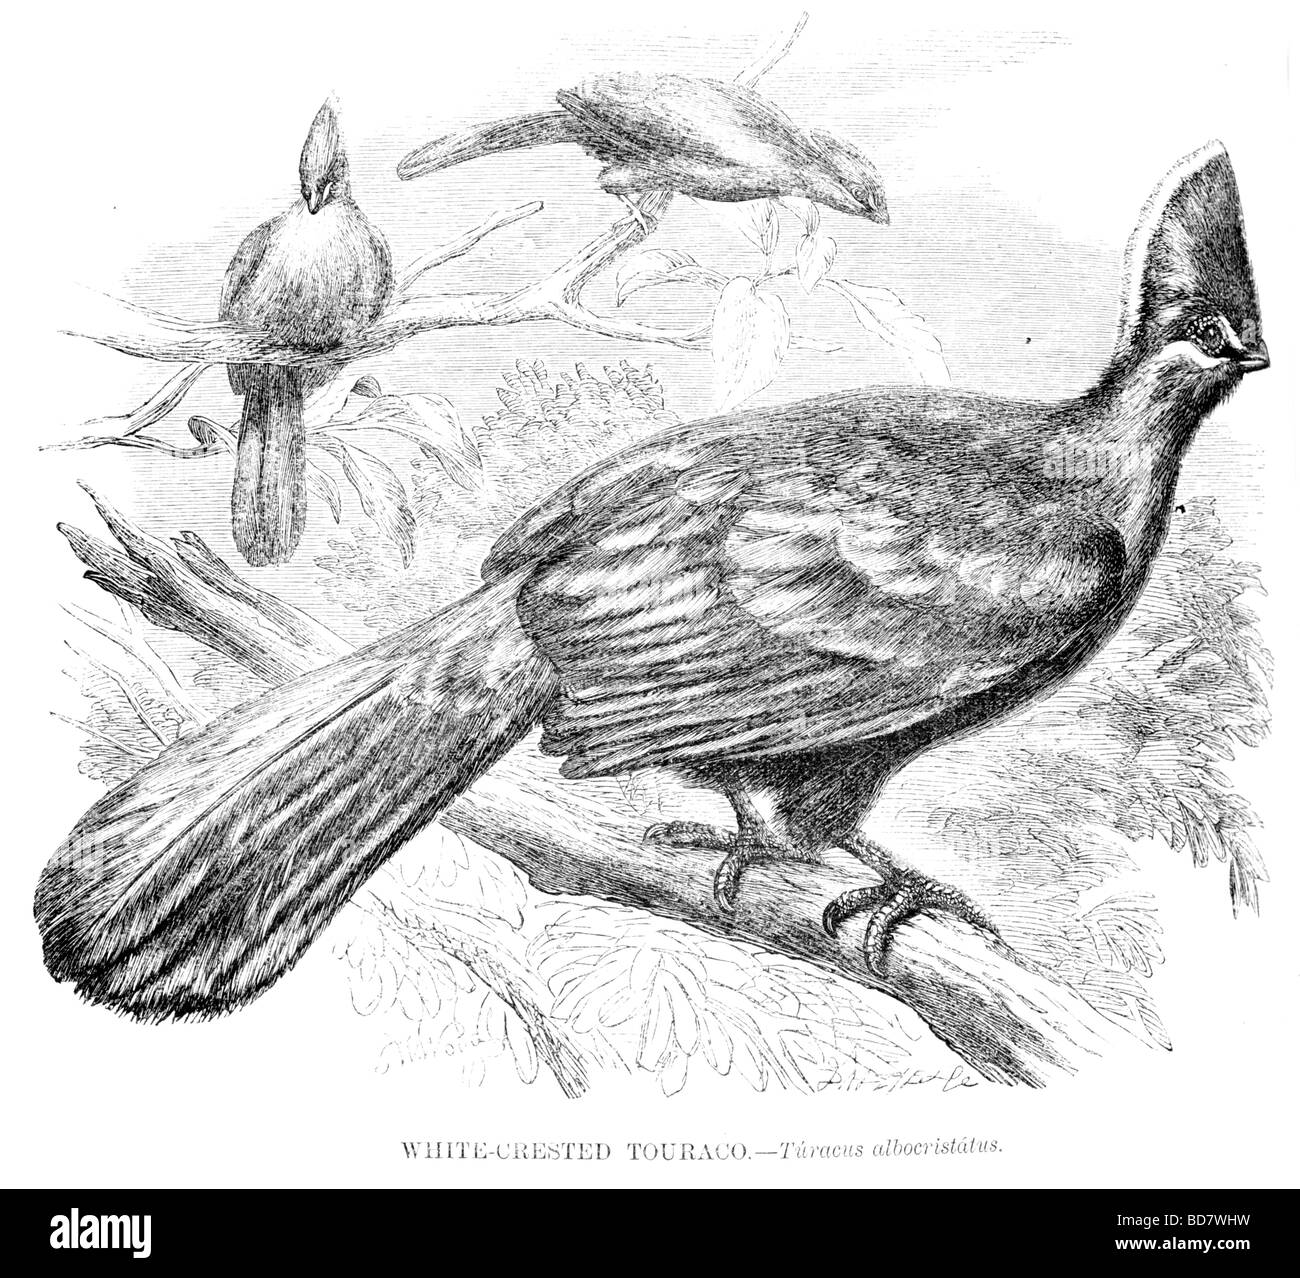 white crested touraco turacus albocristatus - Stock Image